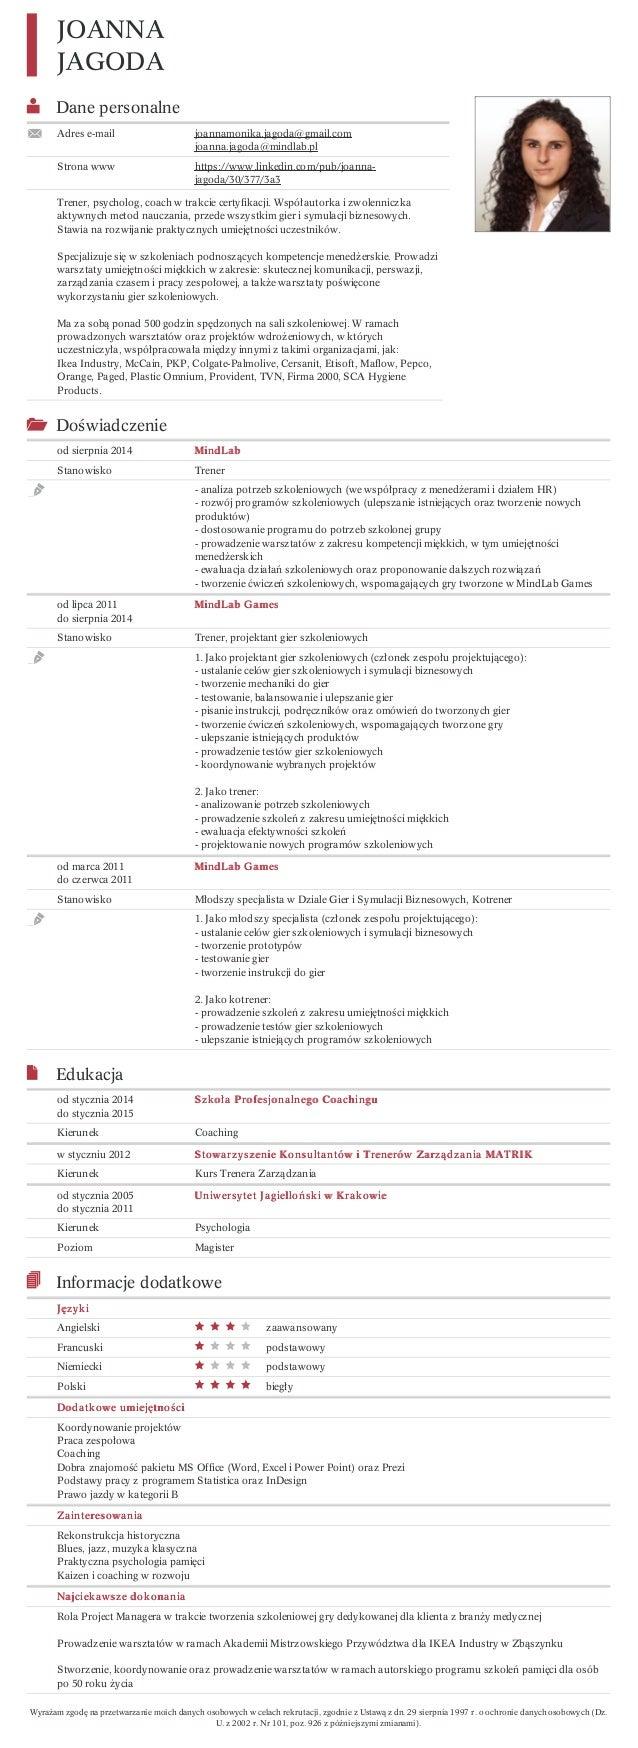 Dane personalne Adres e-mail joannamonika.jagoda@gmail.com joanna.jagoda@mindlab.pl Strona www https://www.linkedin.com/pu...